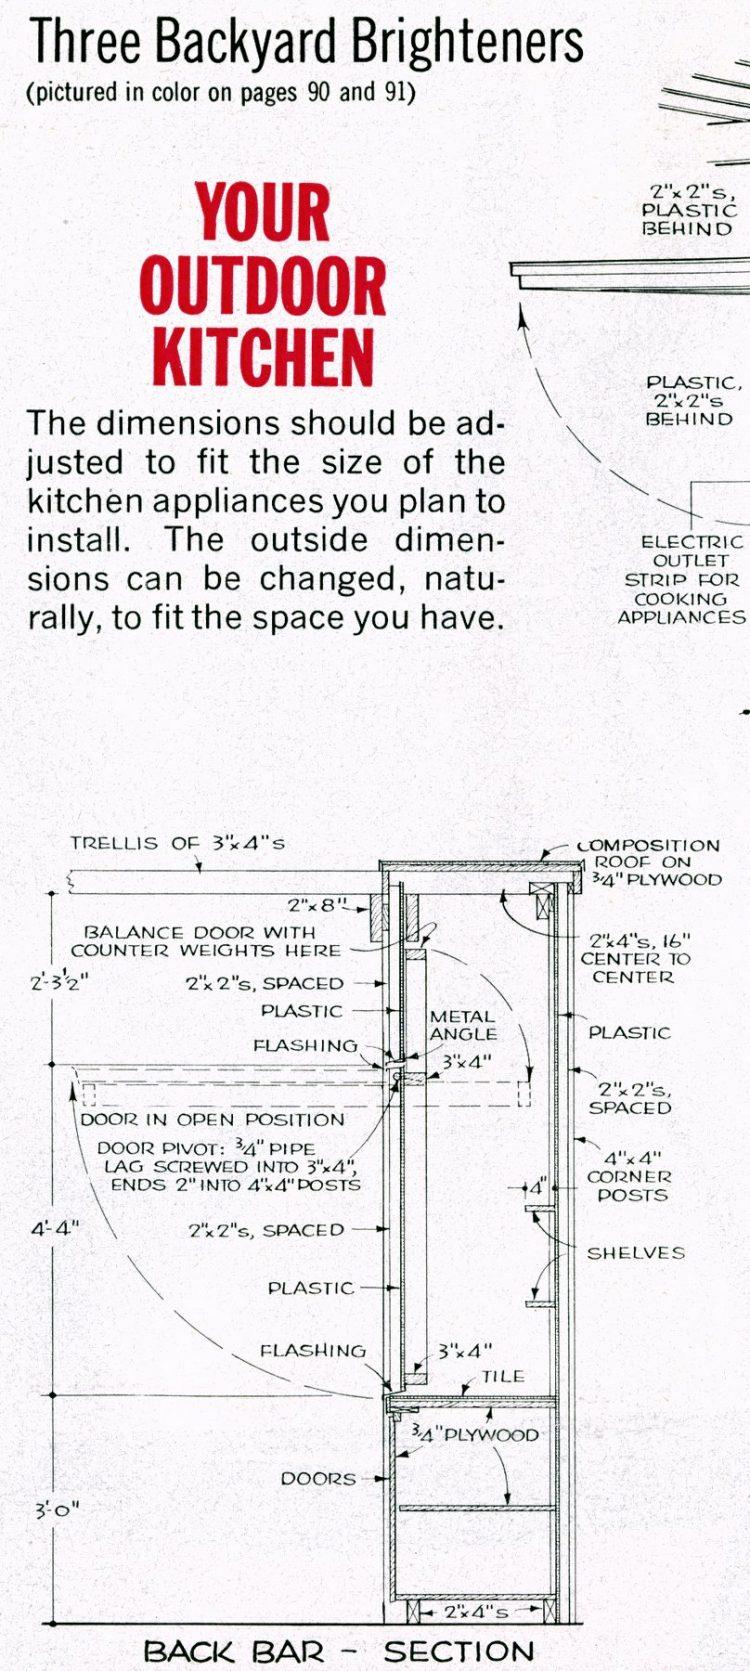 Backyard kitchen design 1965 (2)